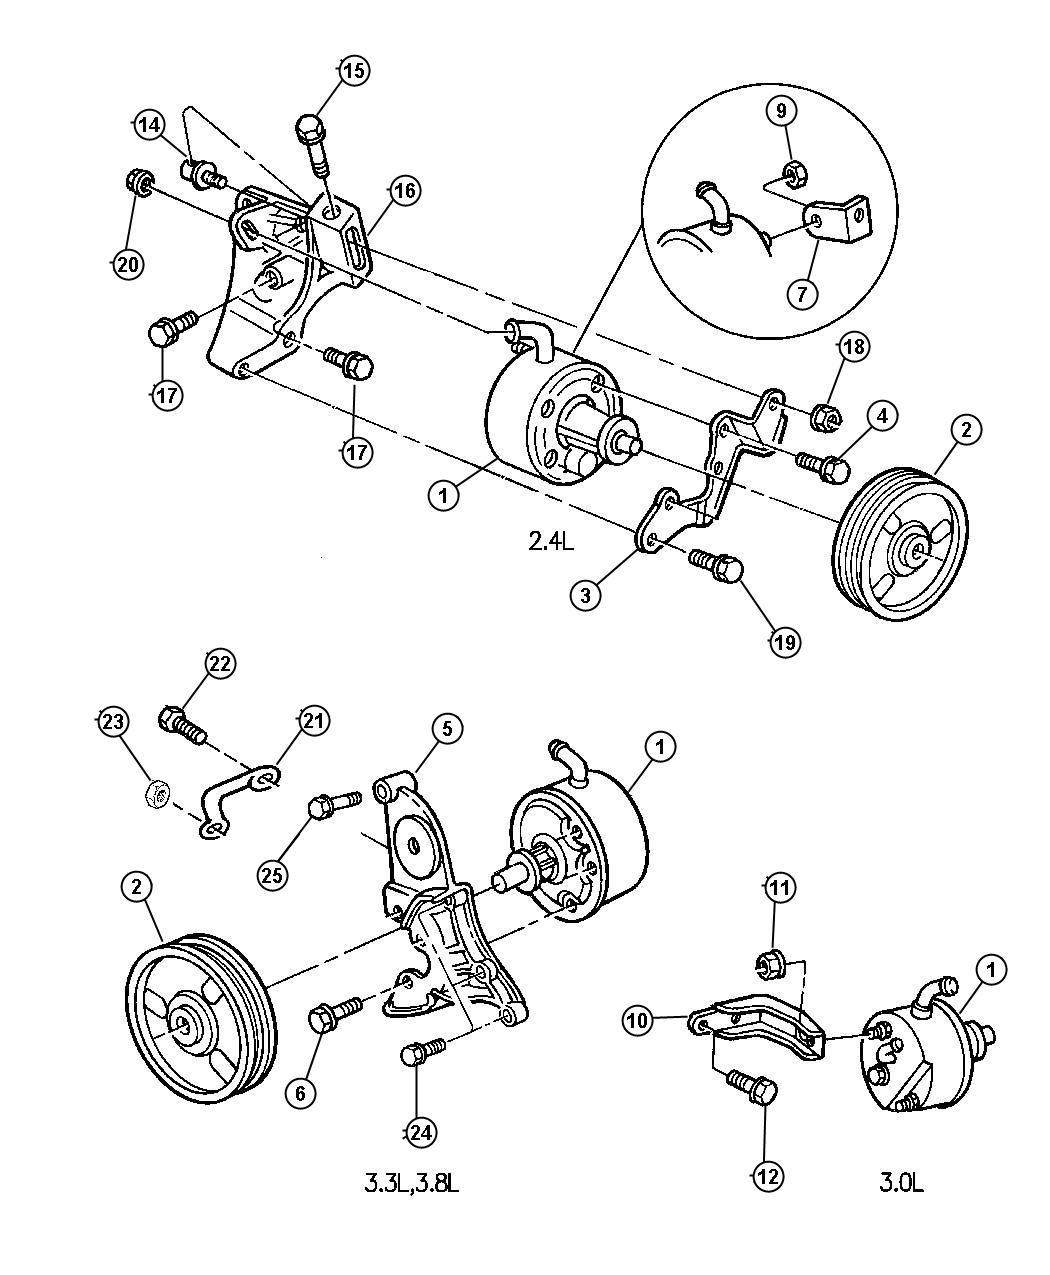 engine diagram for mazda 6 v6 3 0 dohc